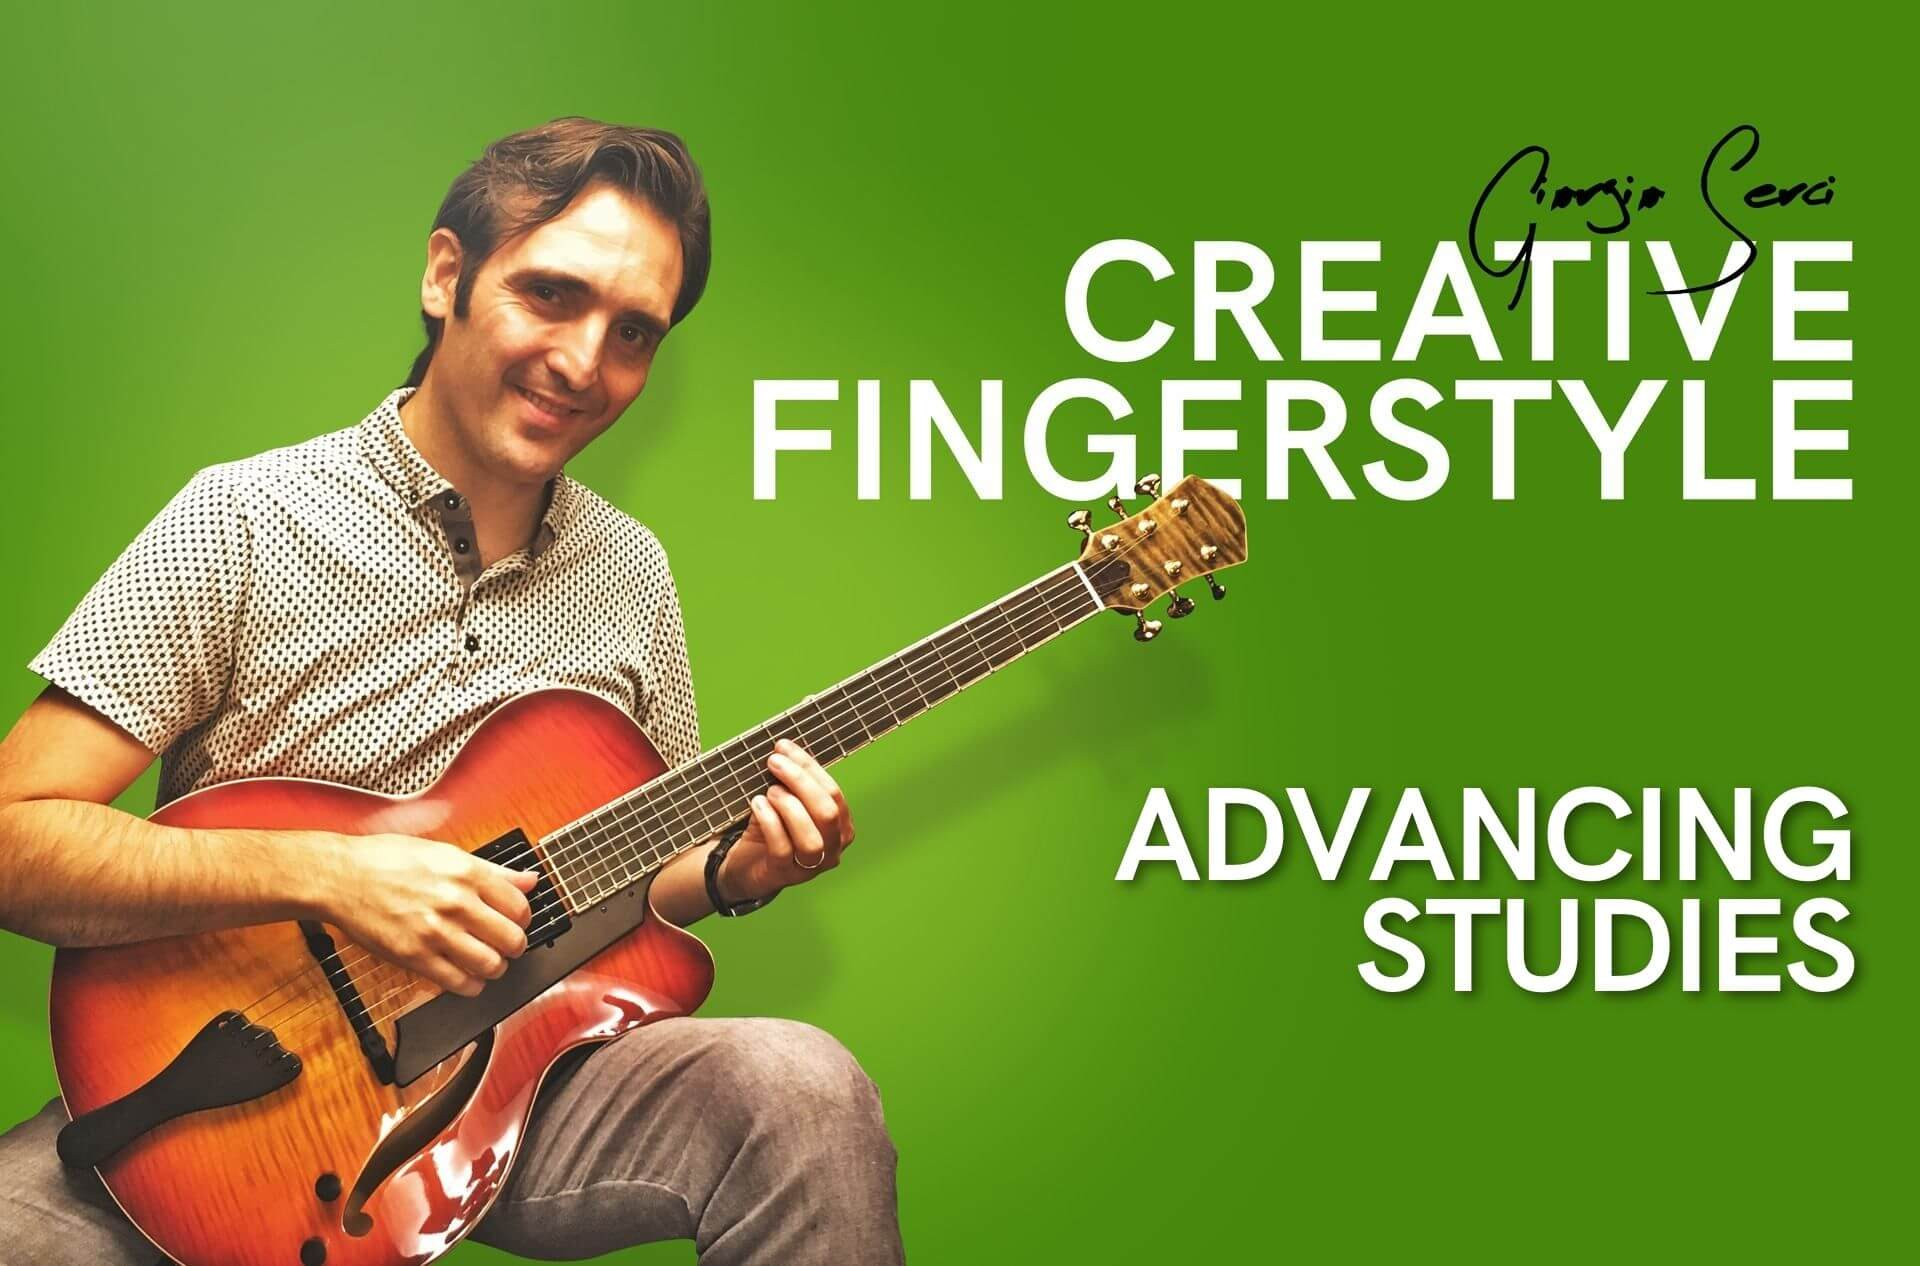 Georgio Serci - Creative Fingerstyle Guitar Advancing Studies